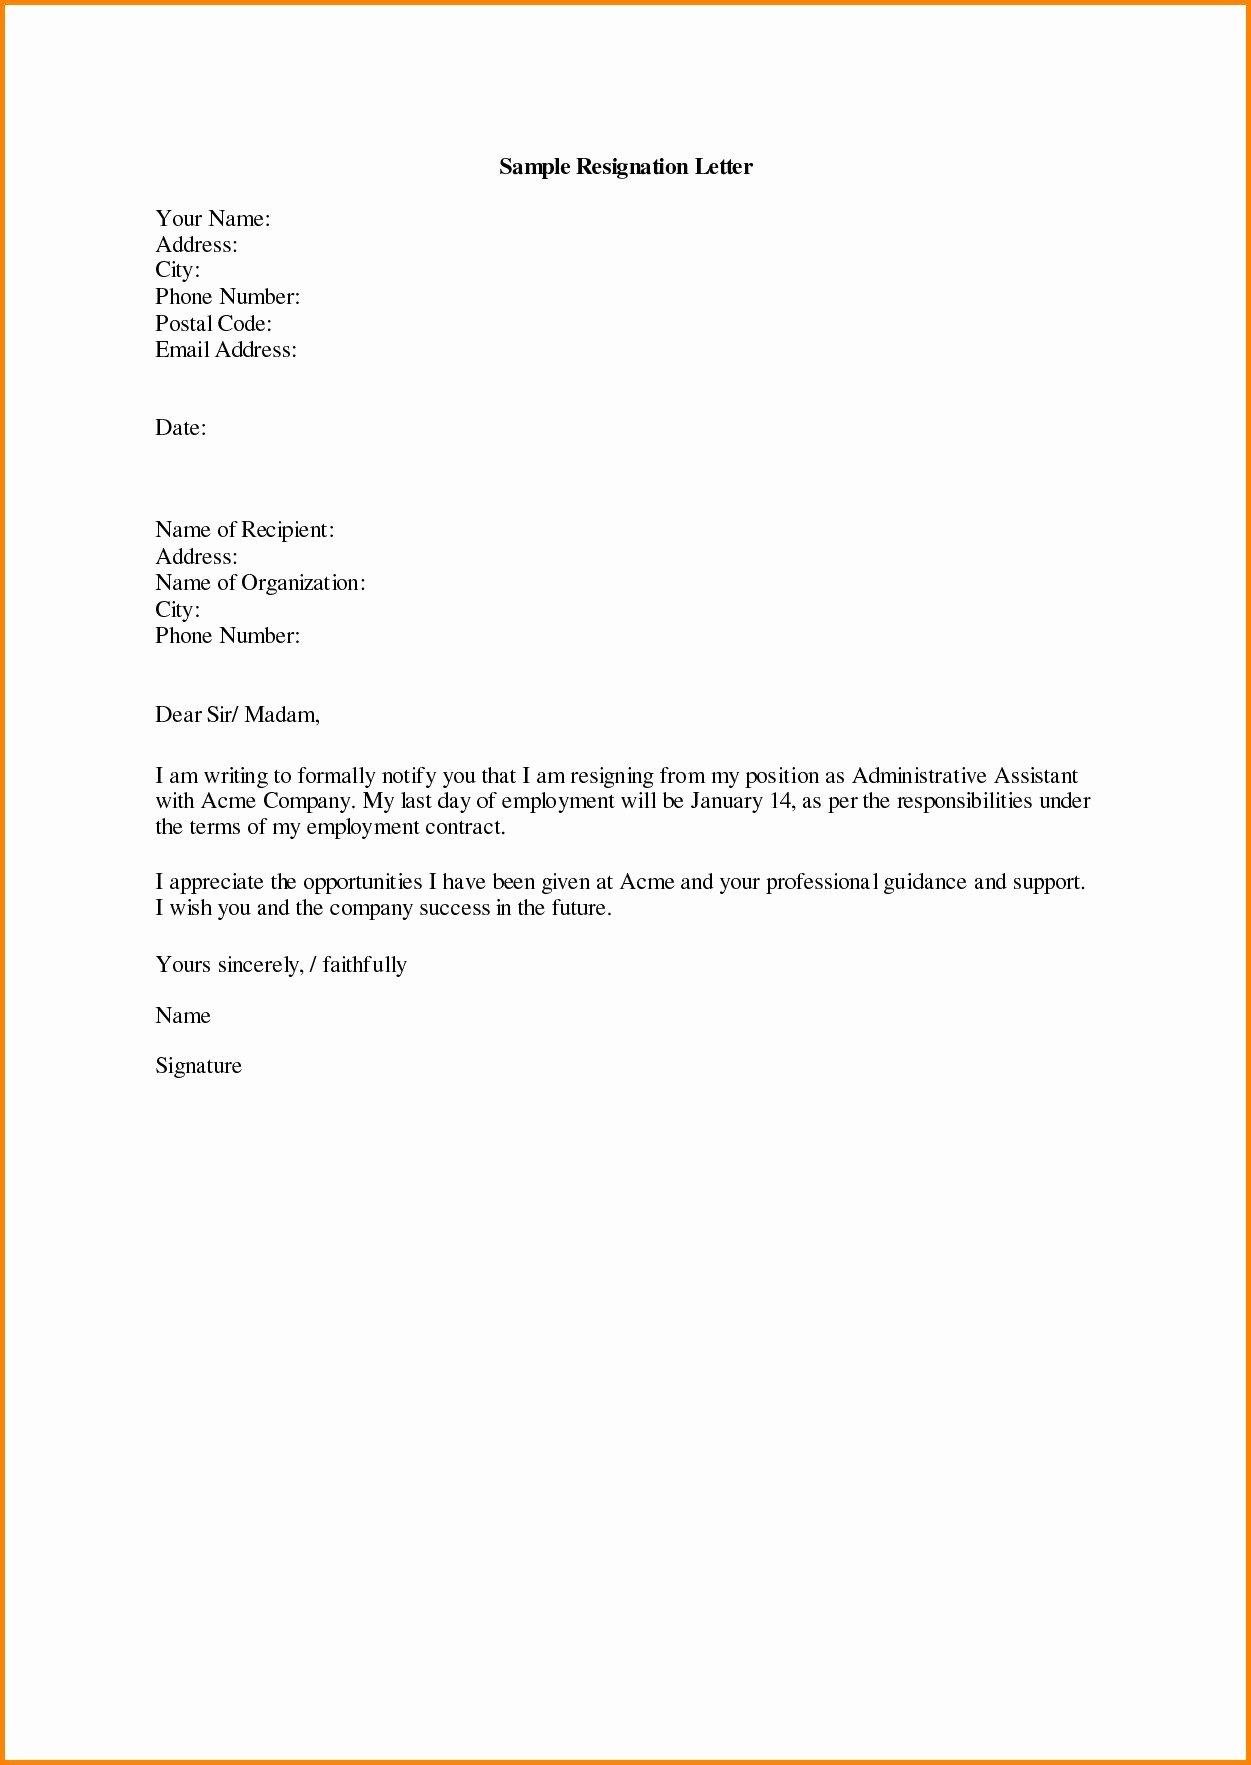 Letter format Google Docs Elegant New Google Docs Resignation Letter Template